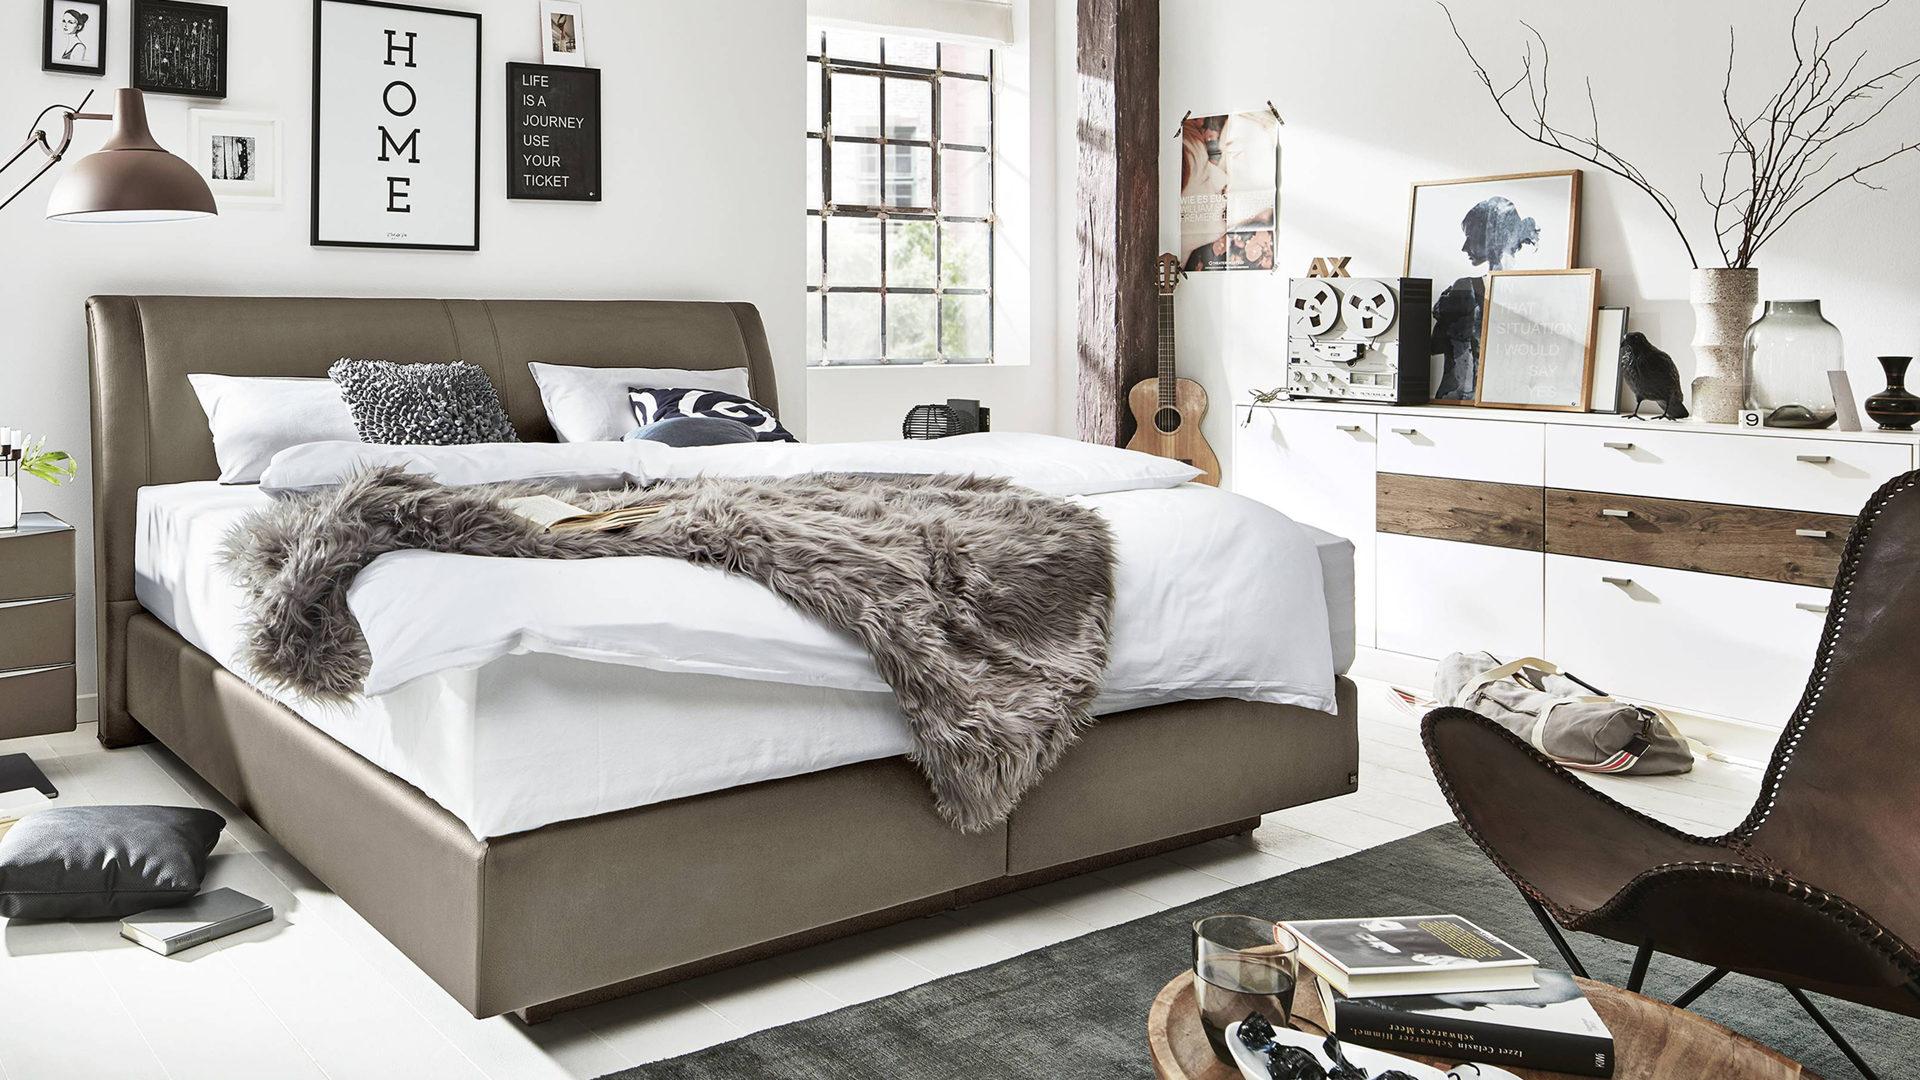 Möbel Boer Coesfeld, Räume, Schlafzimmer, Boxspringbetten ...